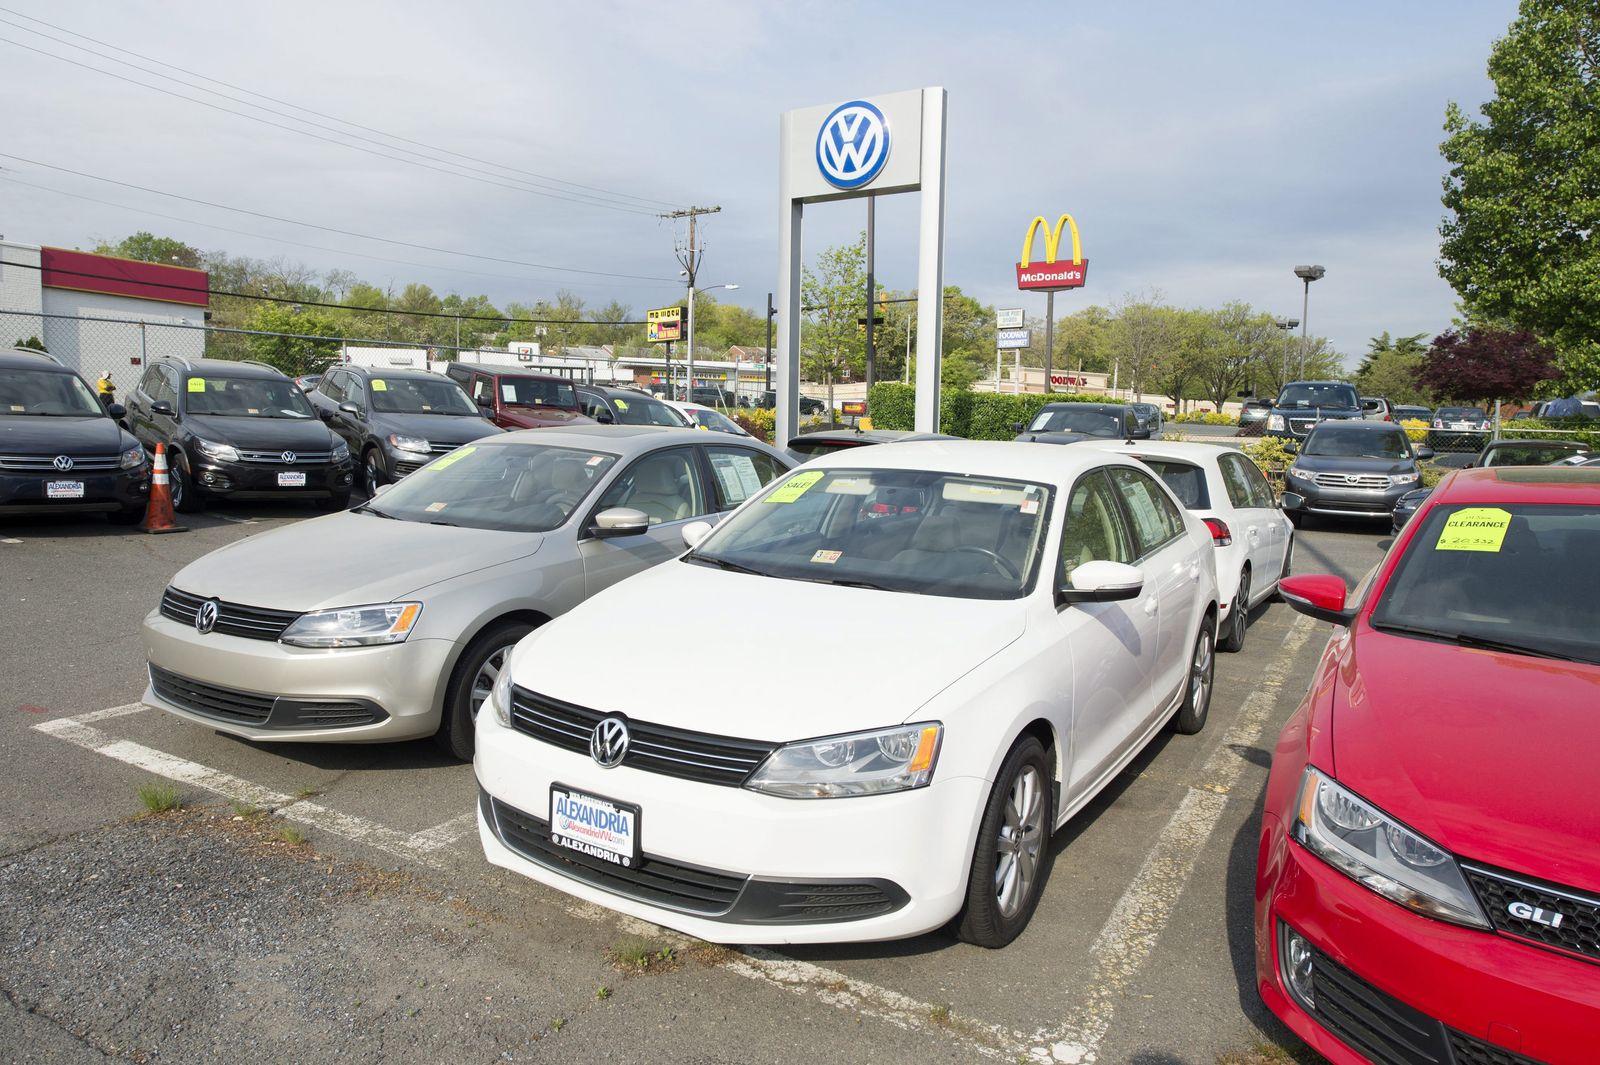 Volkswagen automobiles at a dealership in Alexandria, Virginia